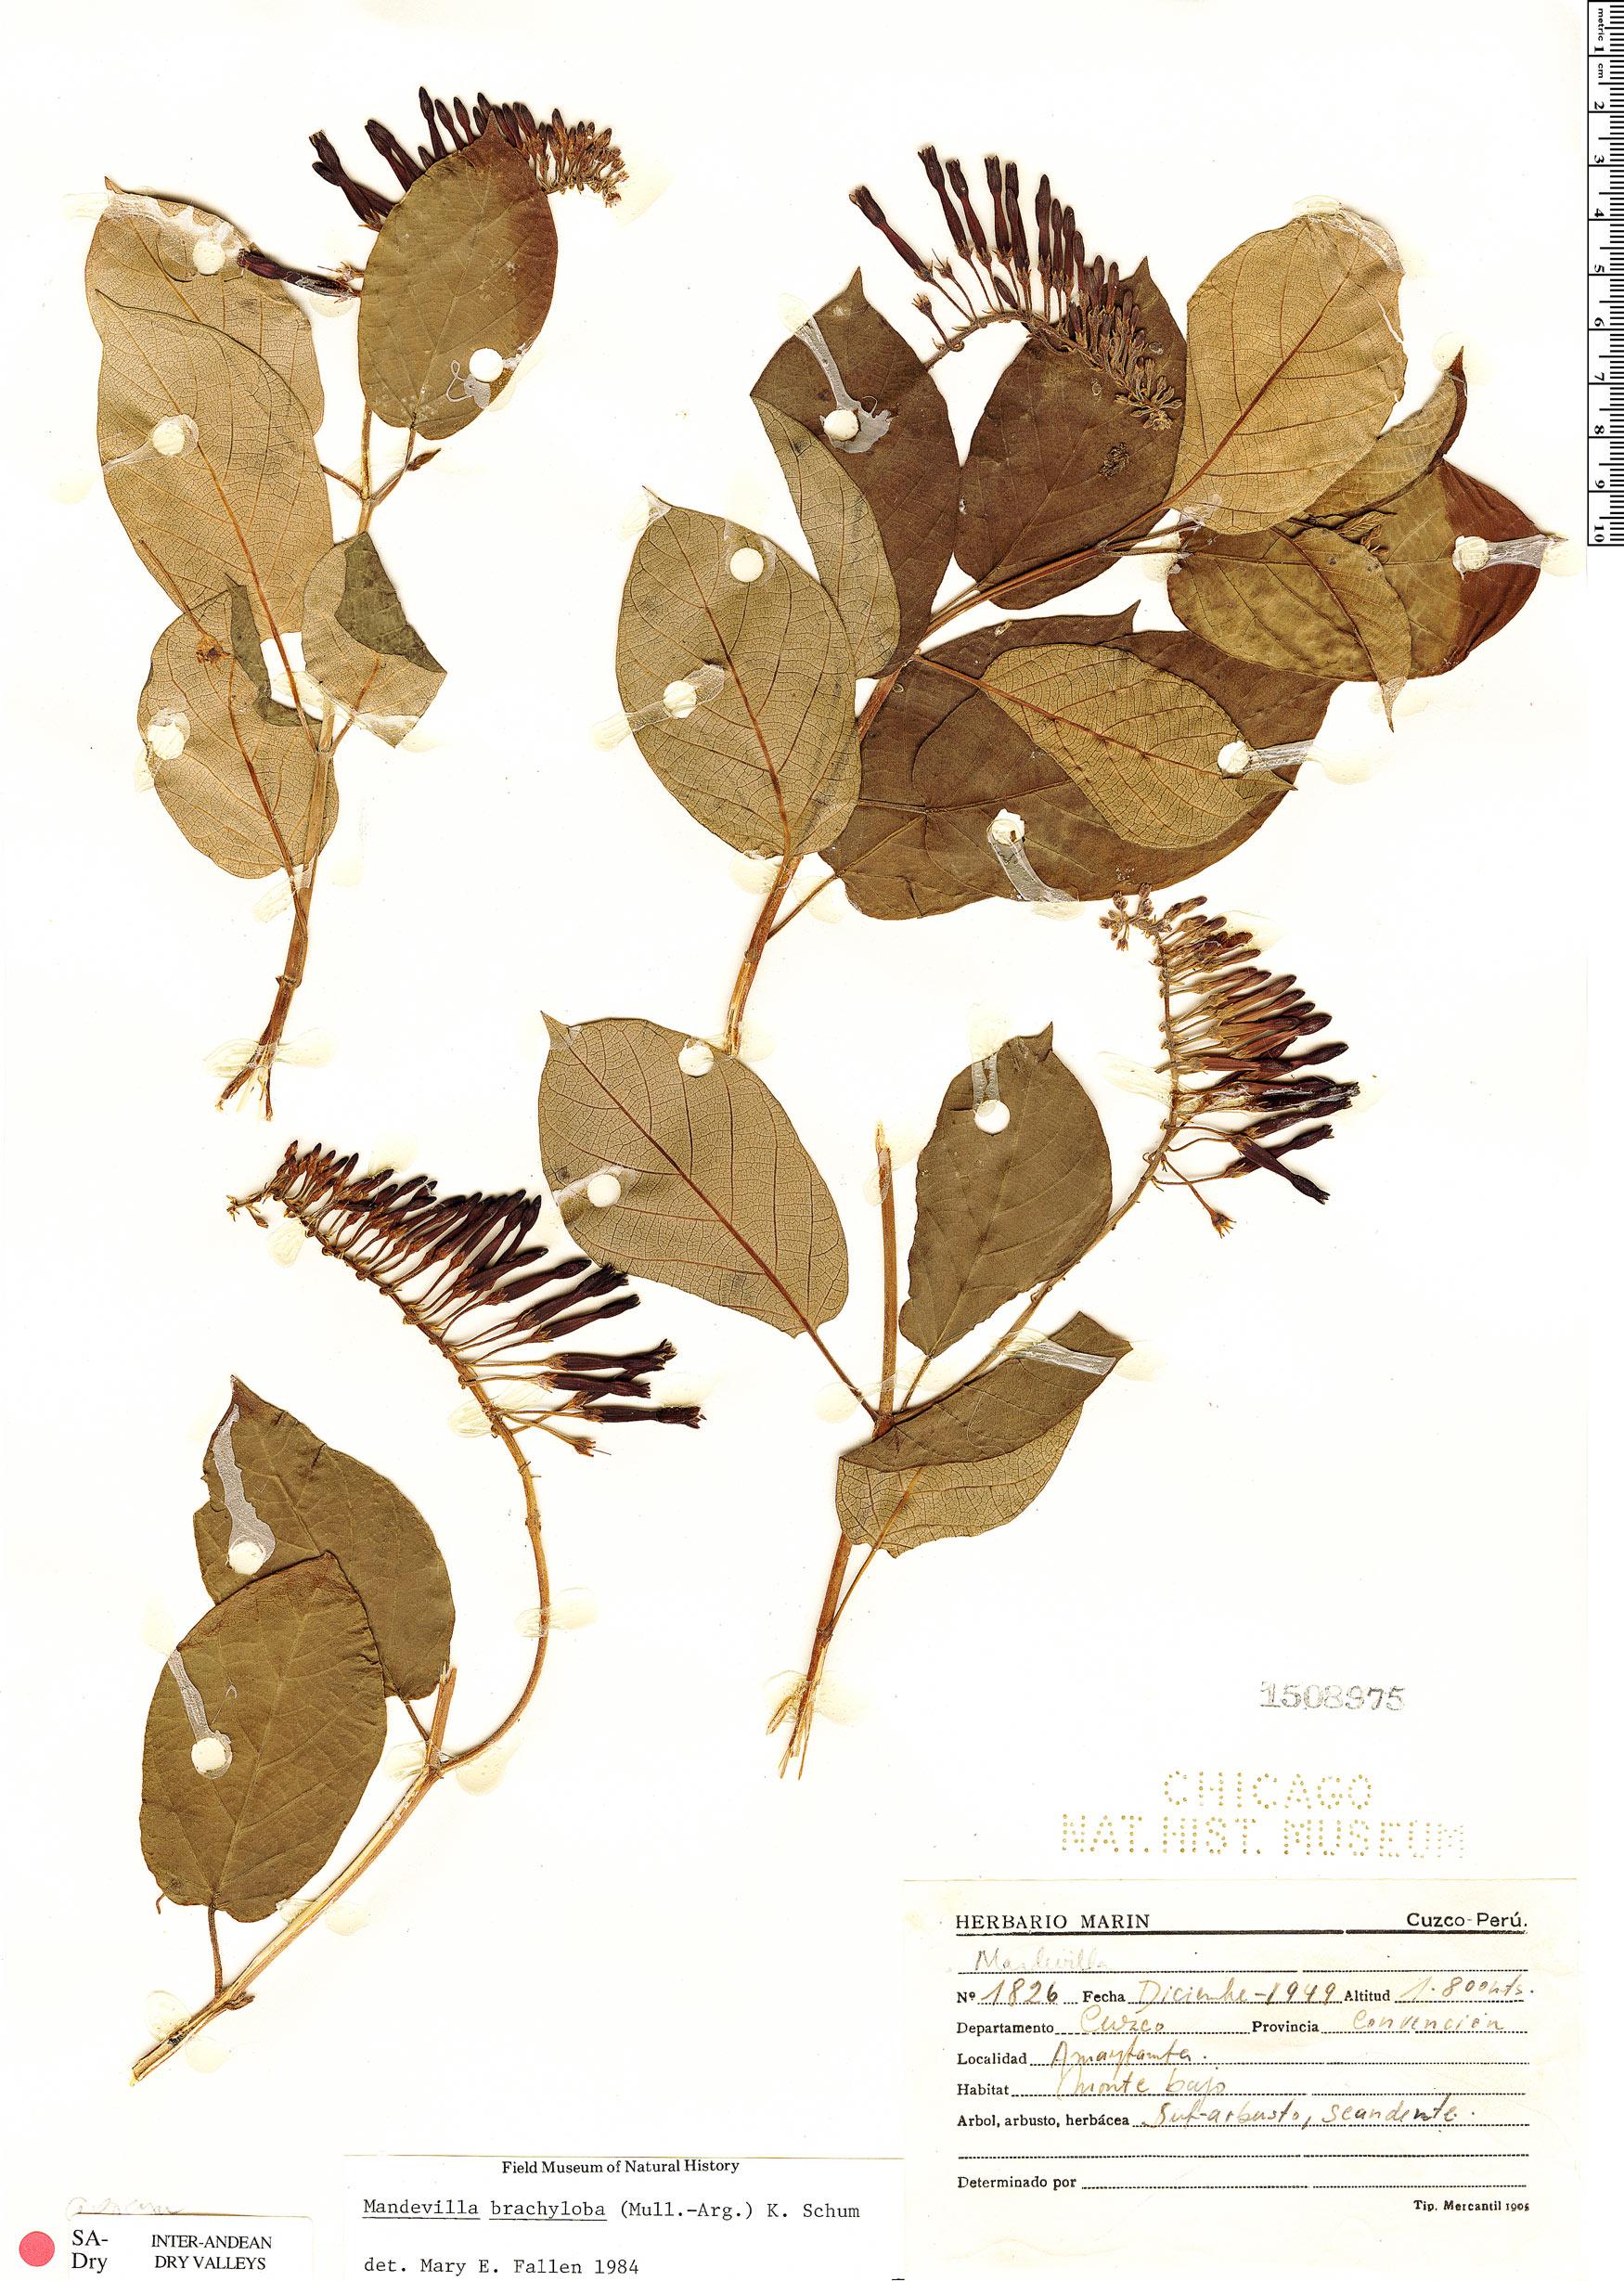 Specimen: Mandevilla brachyloba